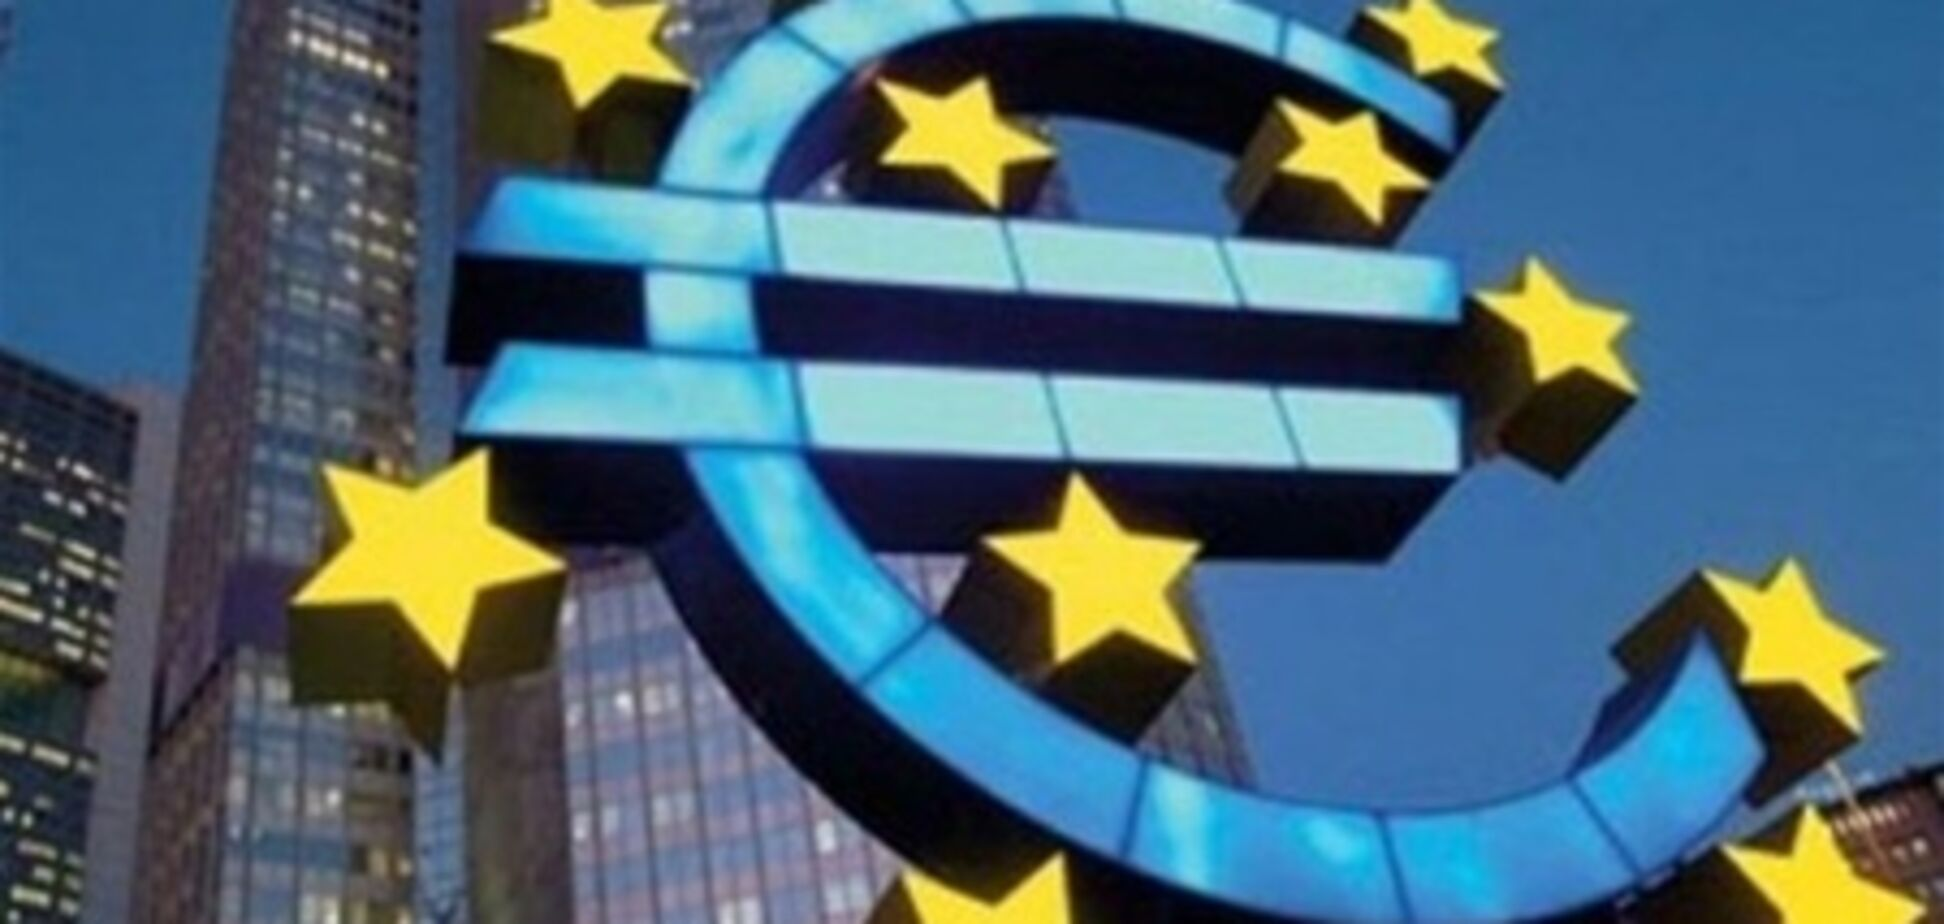 ЕЦБ заявил о стабилизации экономики